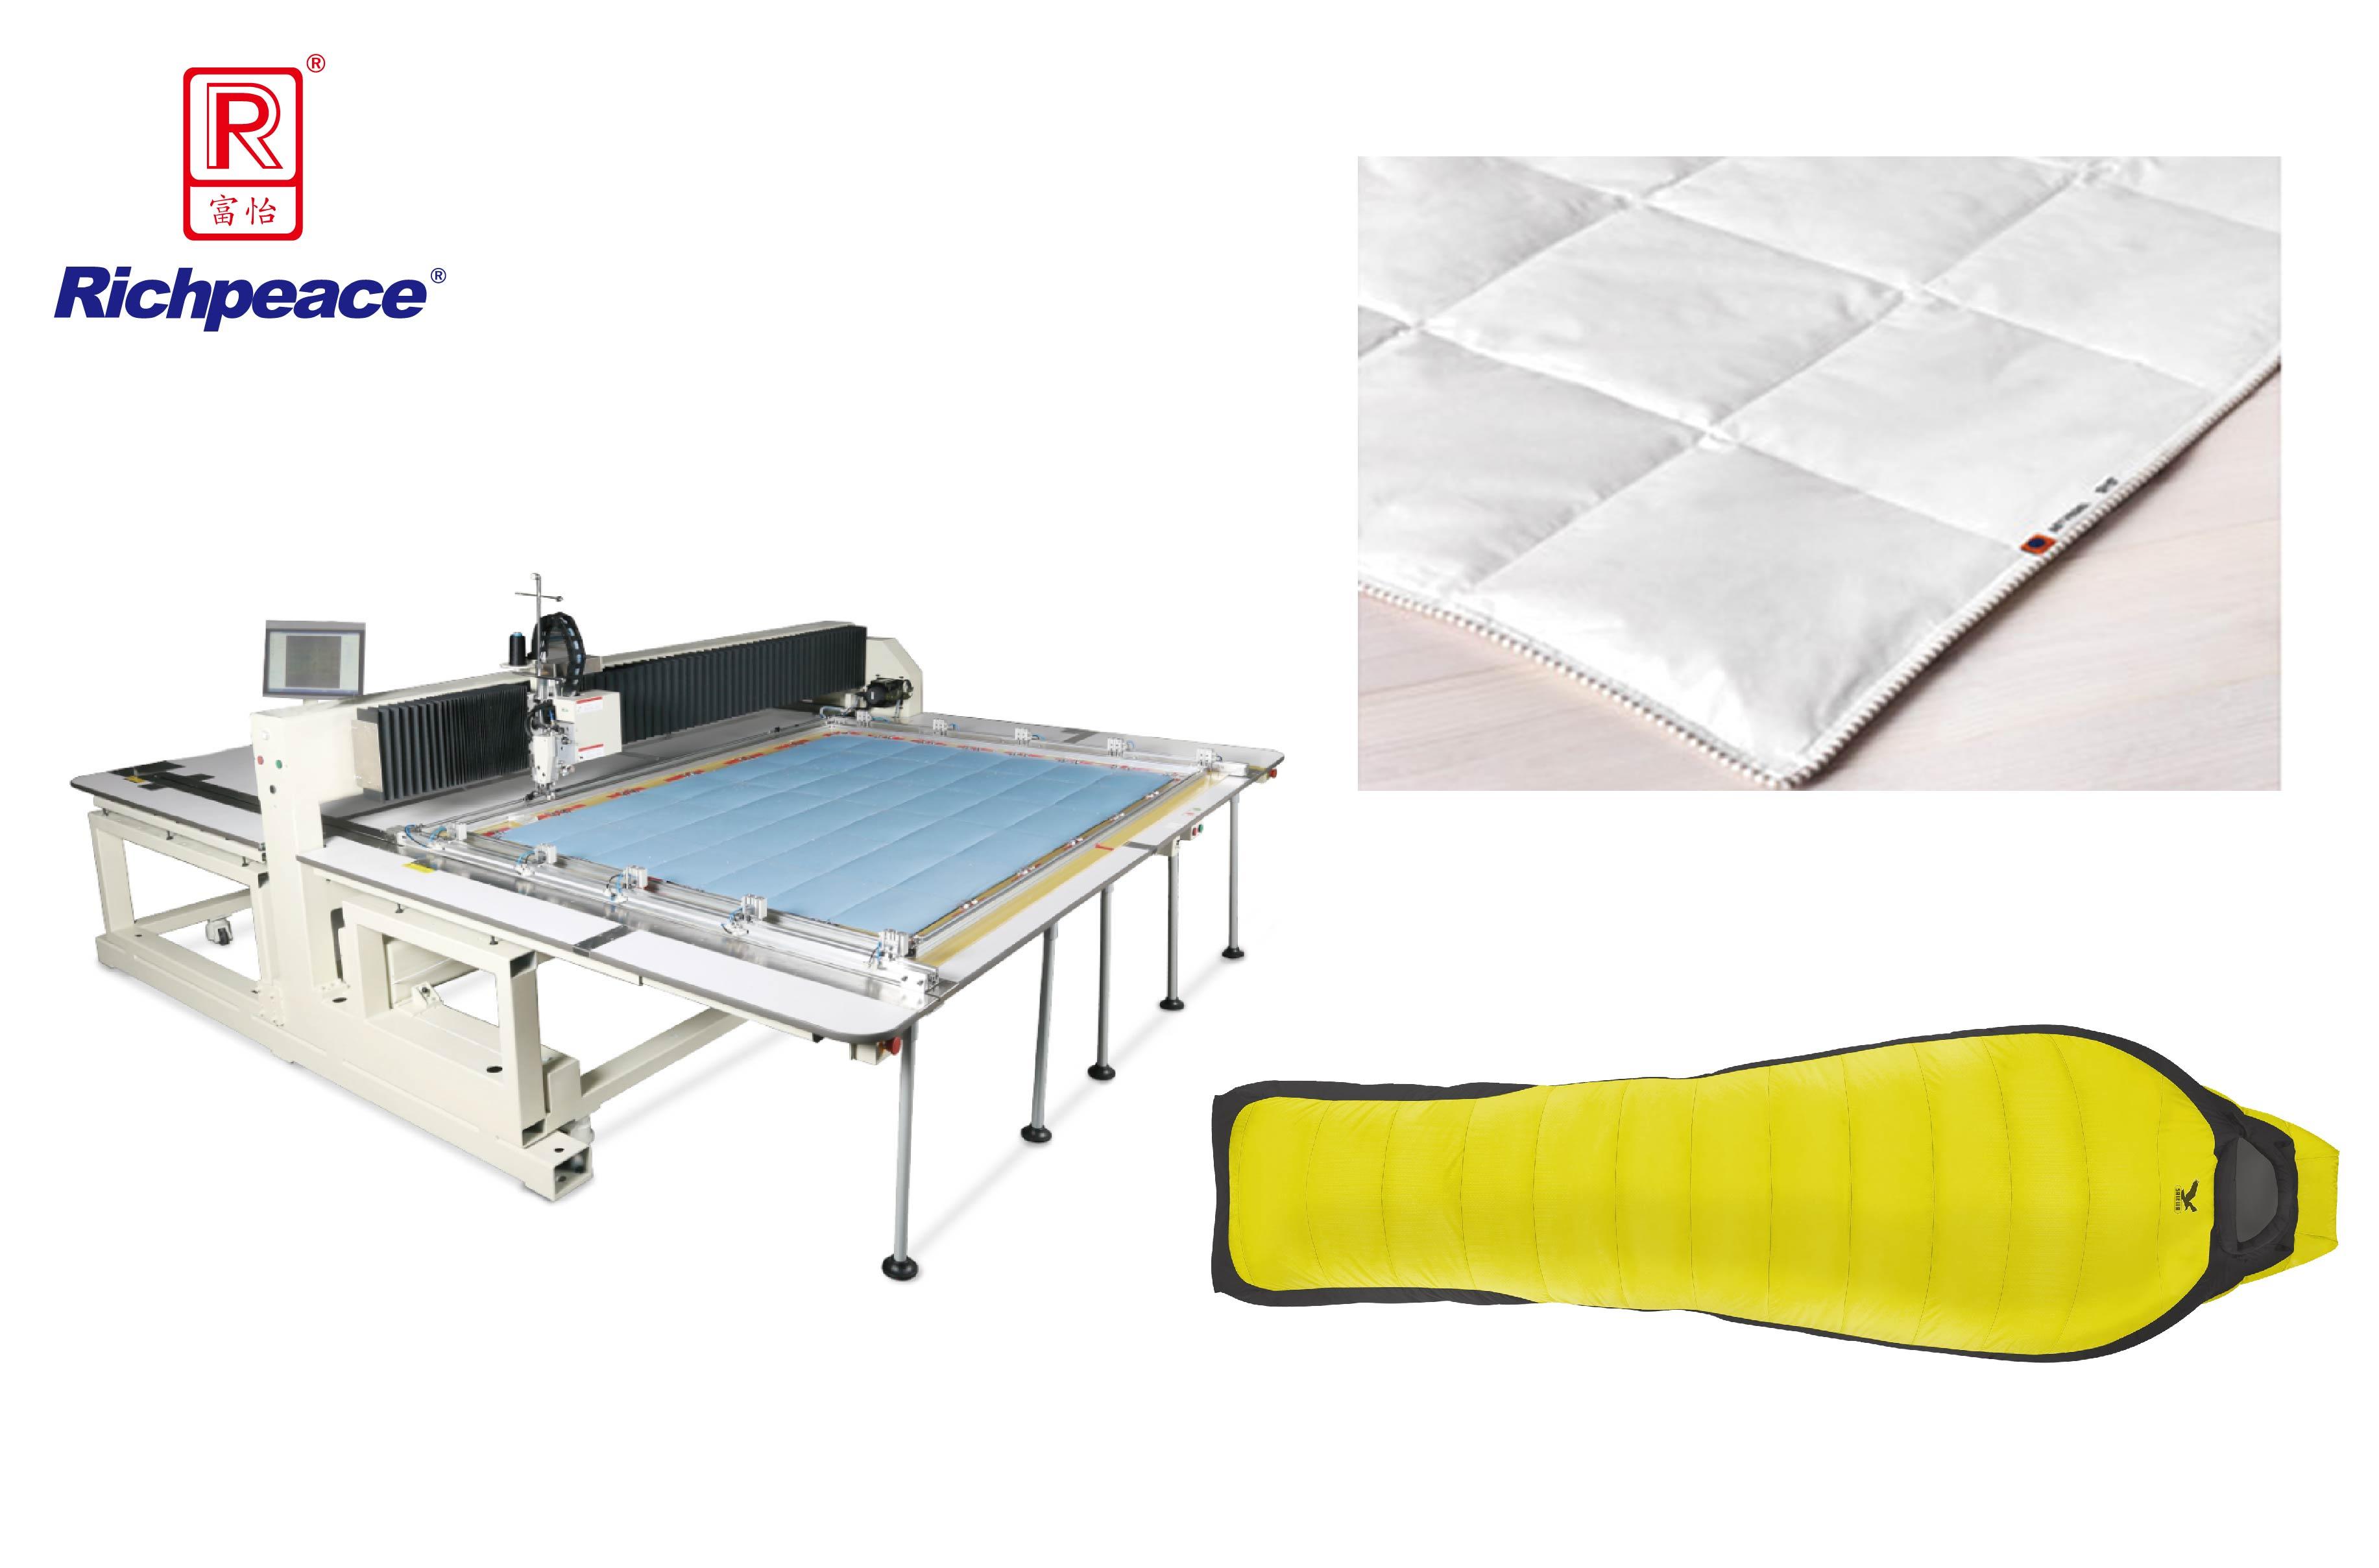 Richpeace Automatic High Precision Sewing Machine